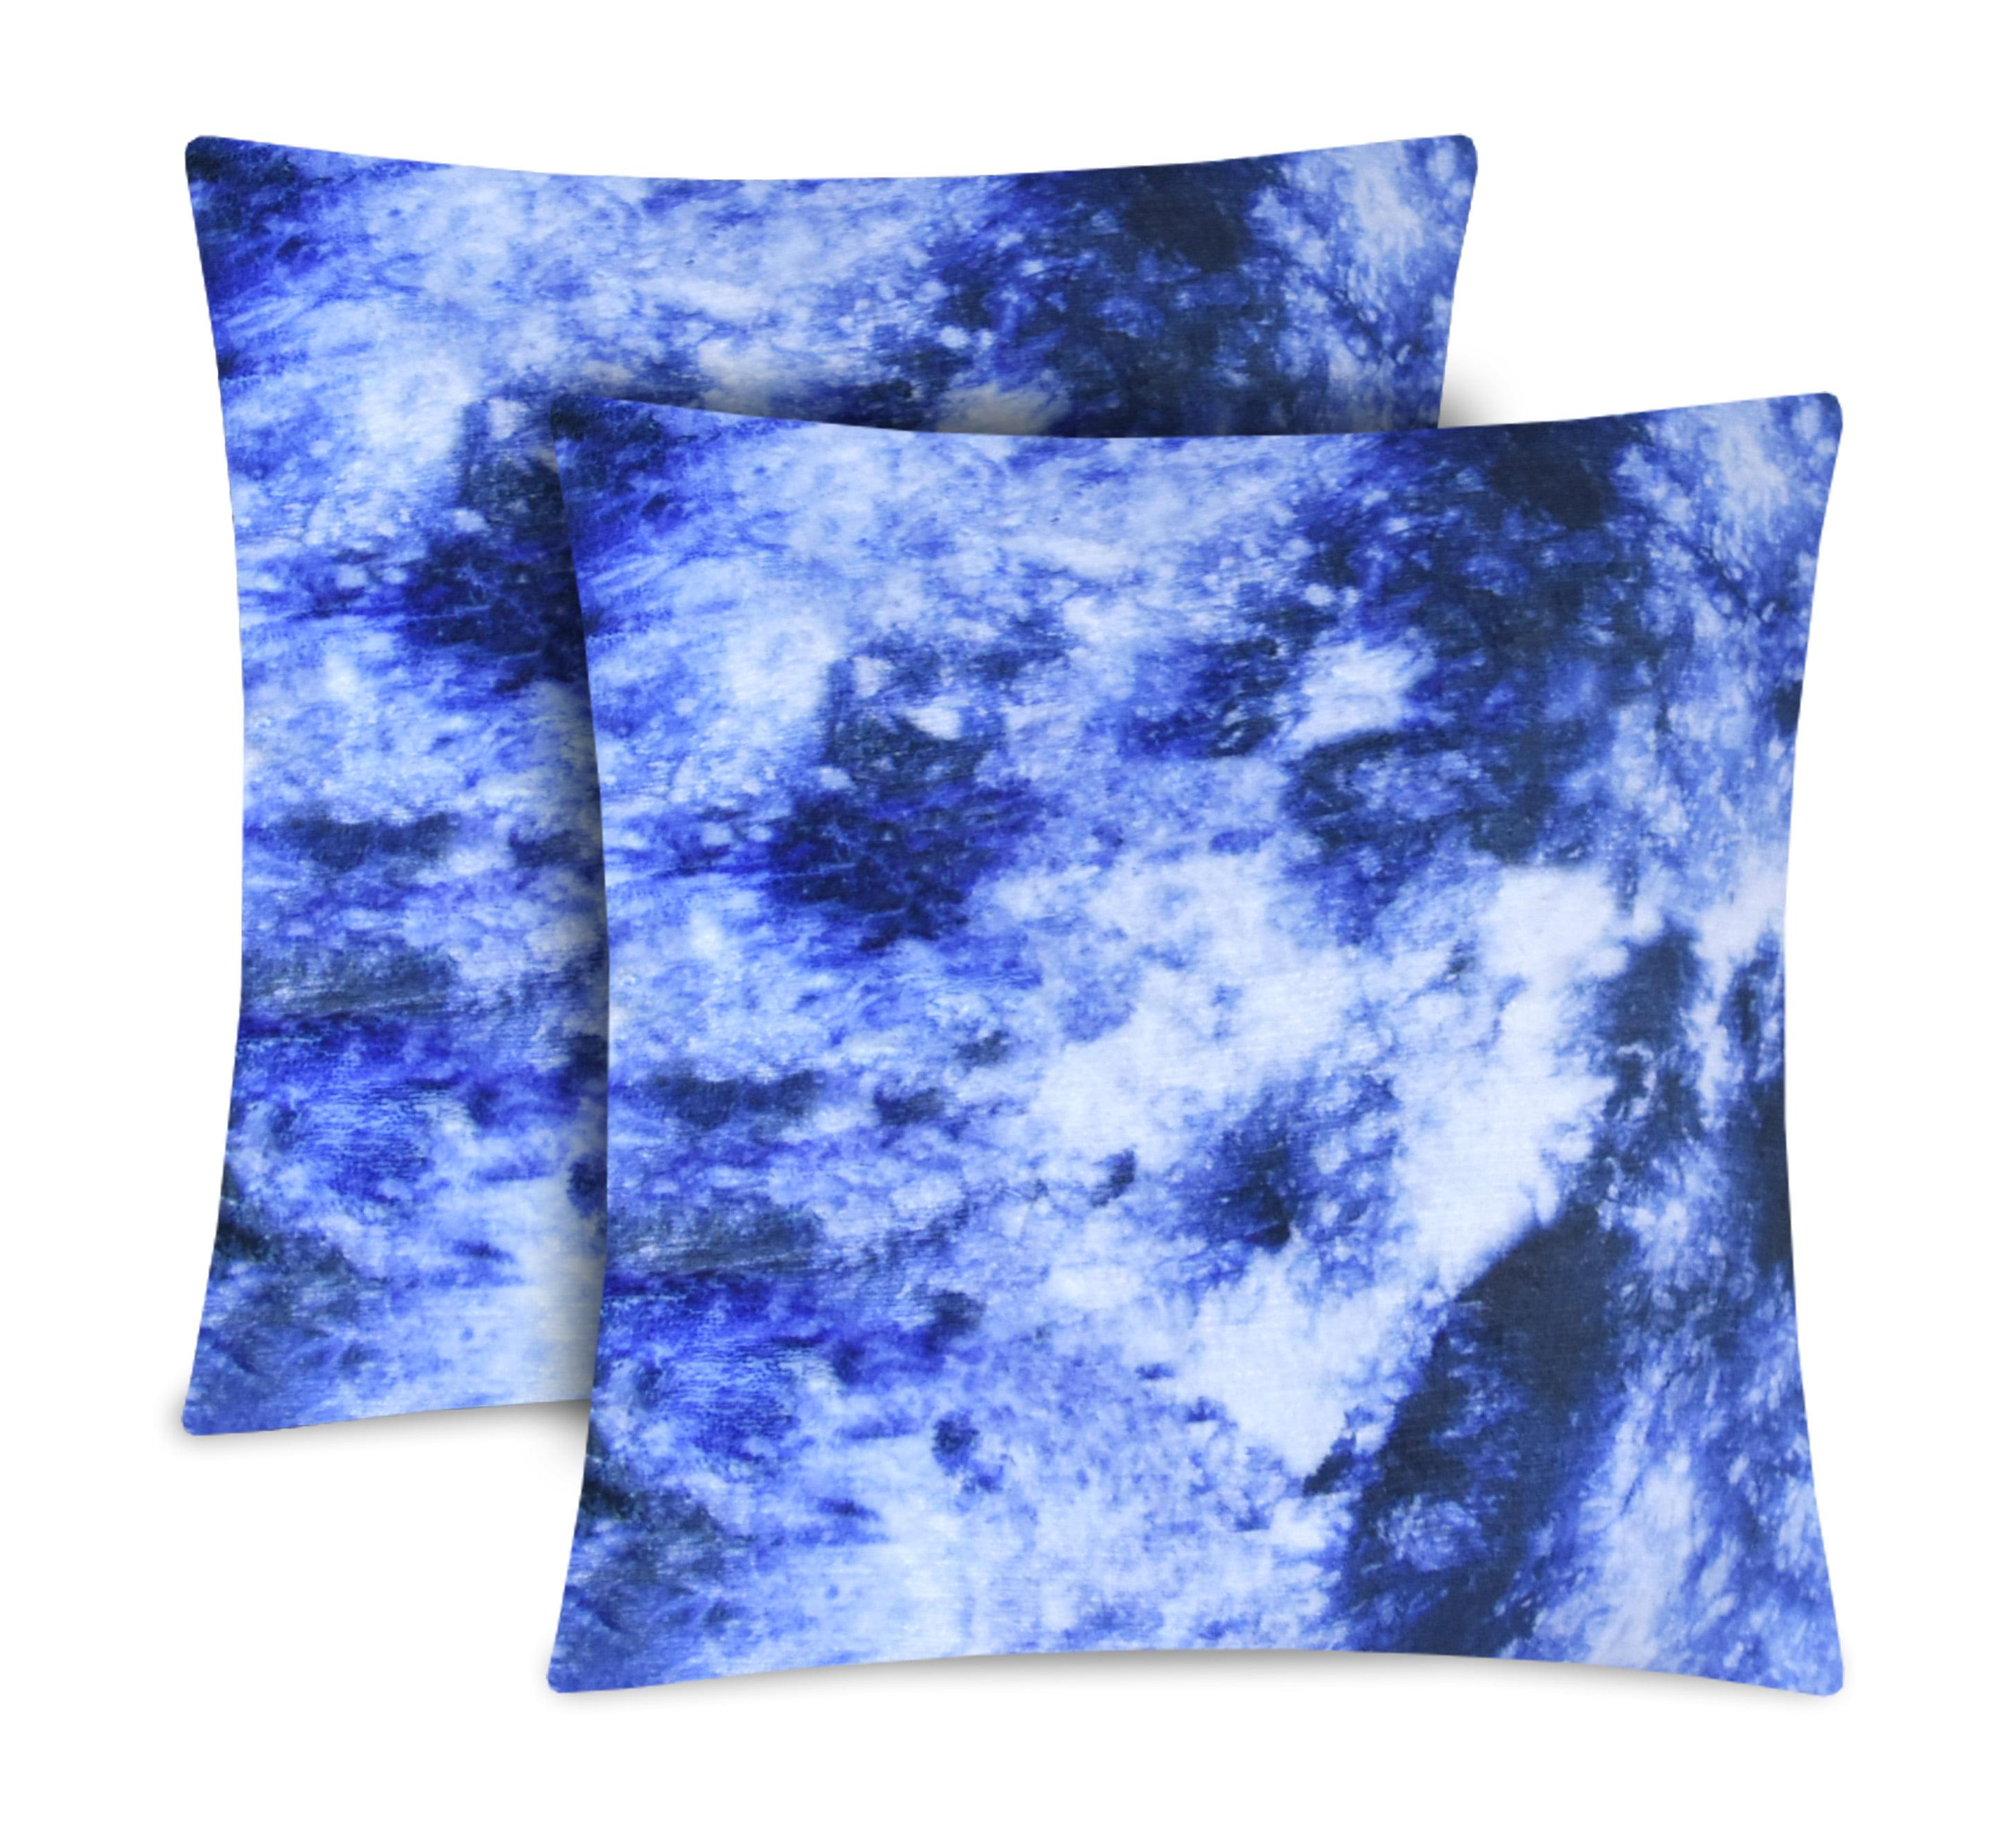 Carolines Treasures VHA3039PW1818 Peace on Earth Fabric Decorative Pillow Patio-Furniture-Pillows Multicolor